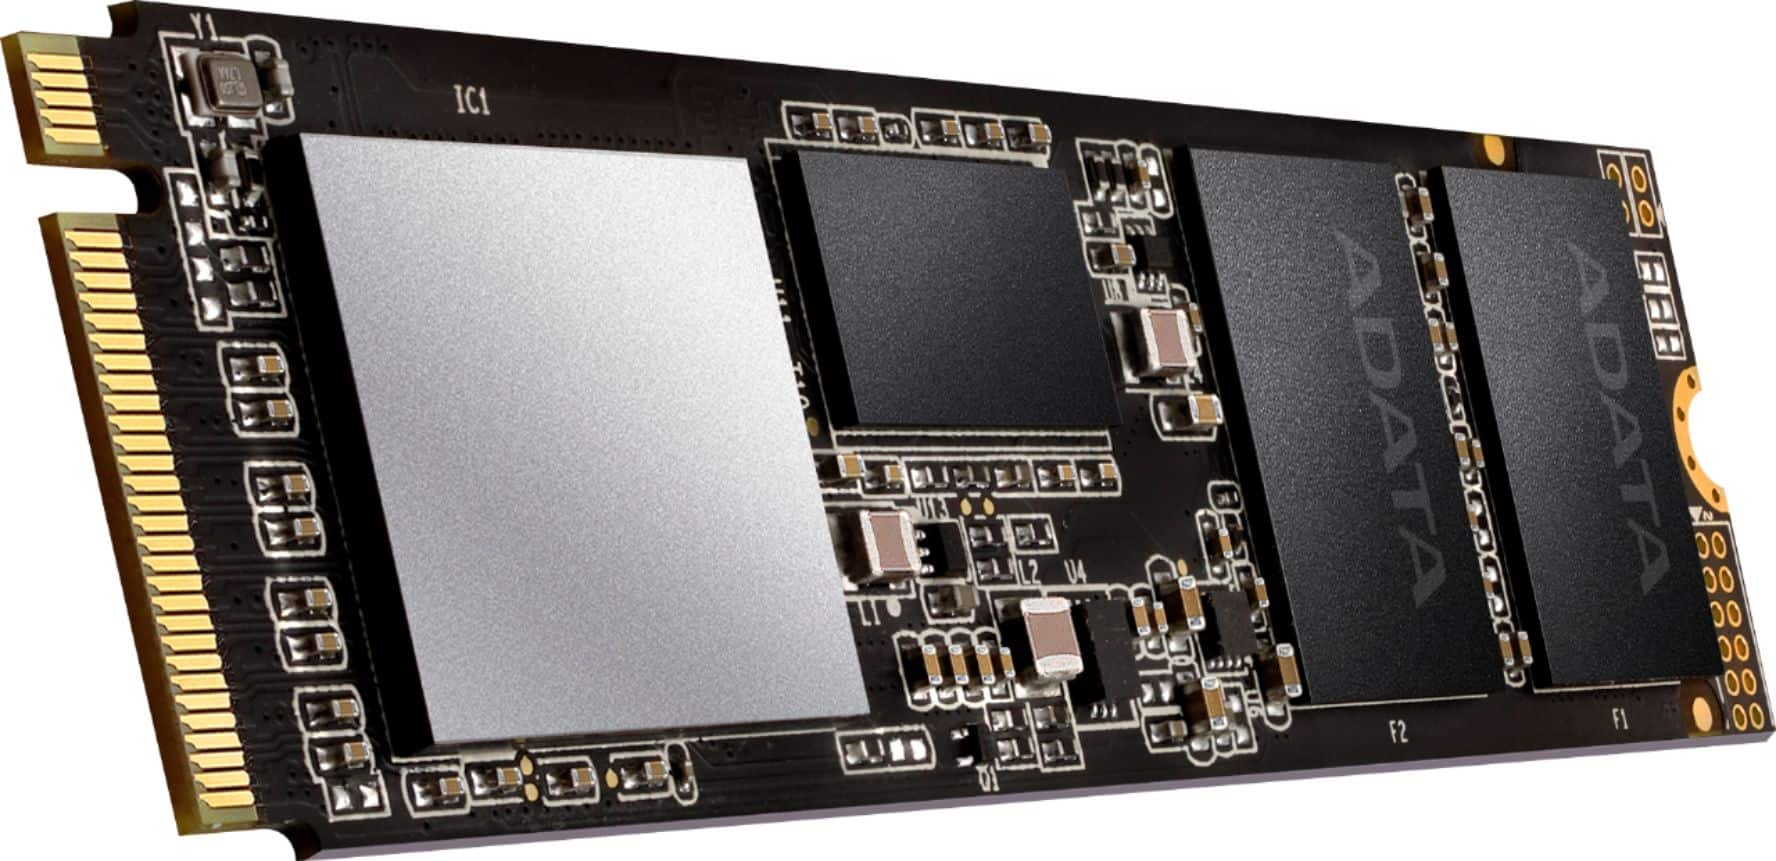 ADATA XPG SX8200 Pro Series 1TB PCIe Gen 3 x4 M.2 2280 Internal Solid State Drive with Flash 3D Nand Technology ASX8200PNP-1TT-C - $99.99